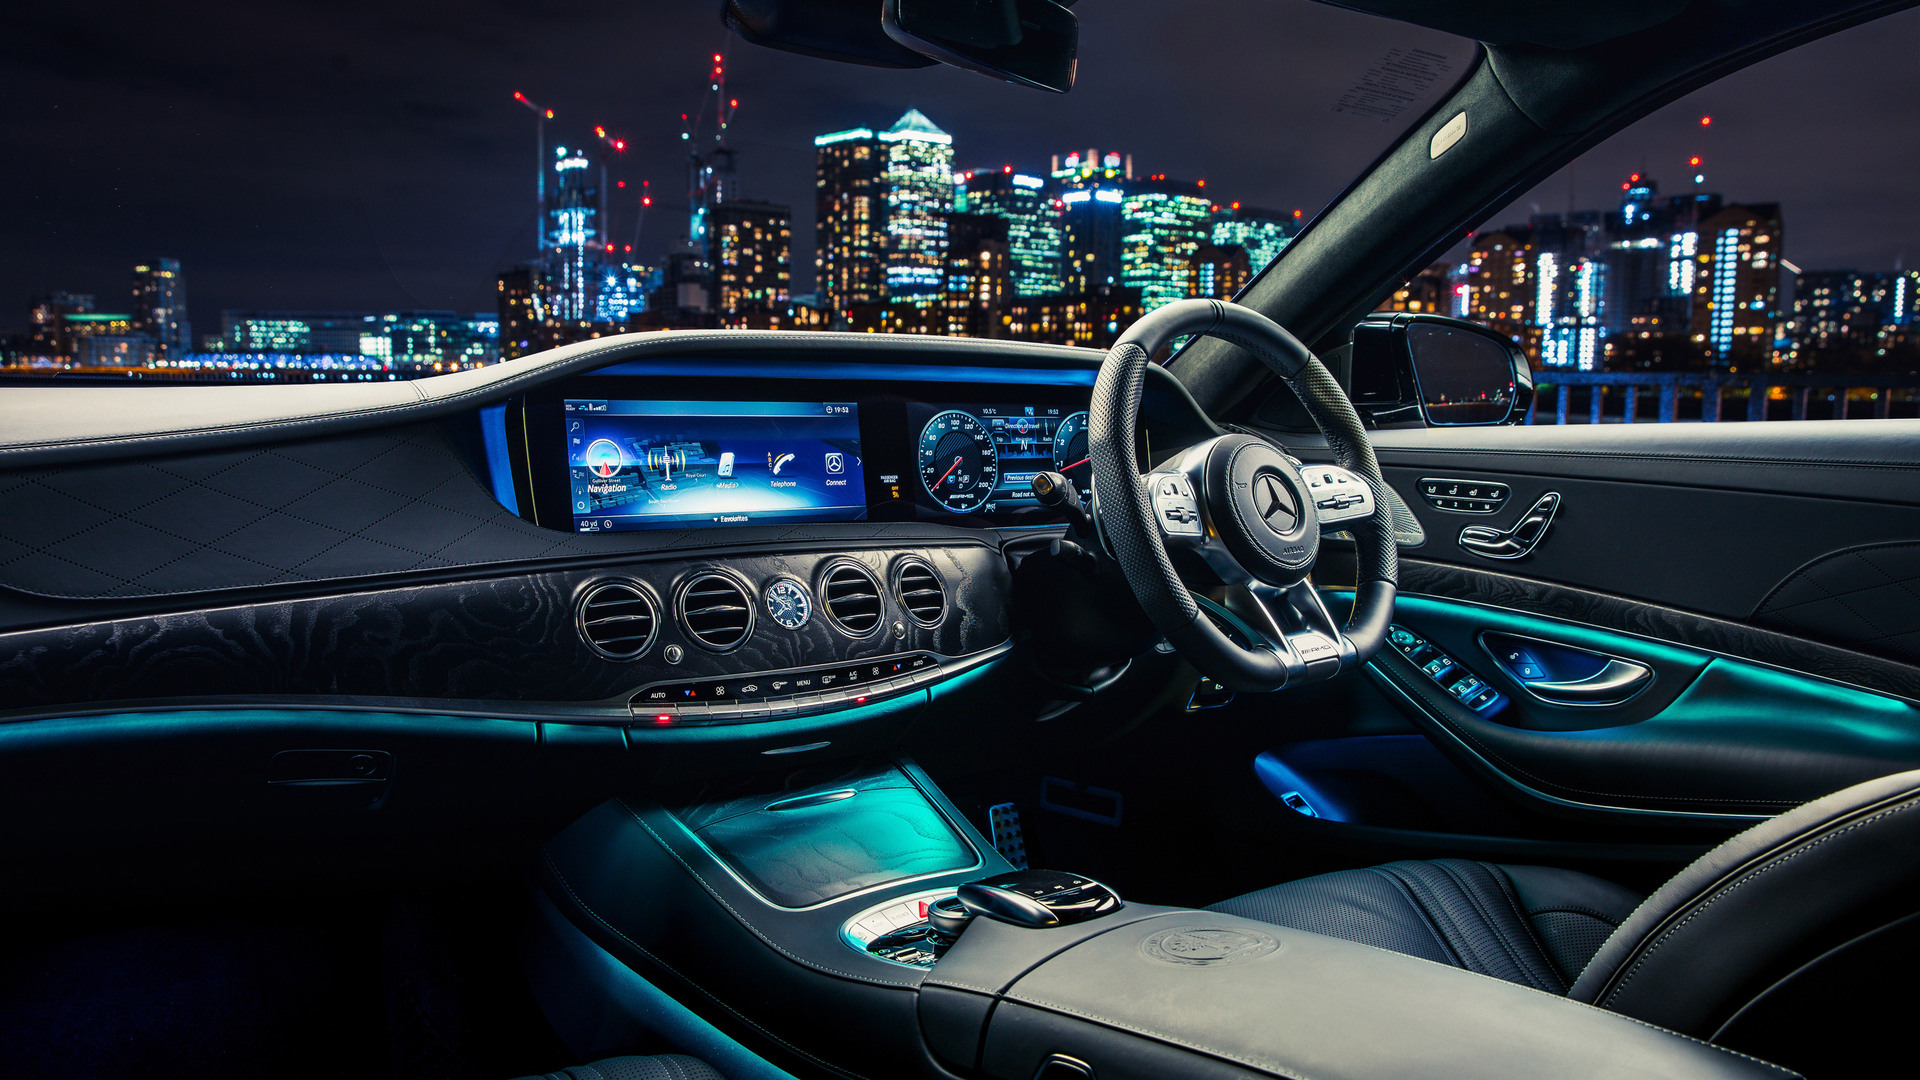 1920x1080 Mercedes AMG S 63 4MATIC Interior Laptop Full HD ...